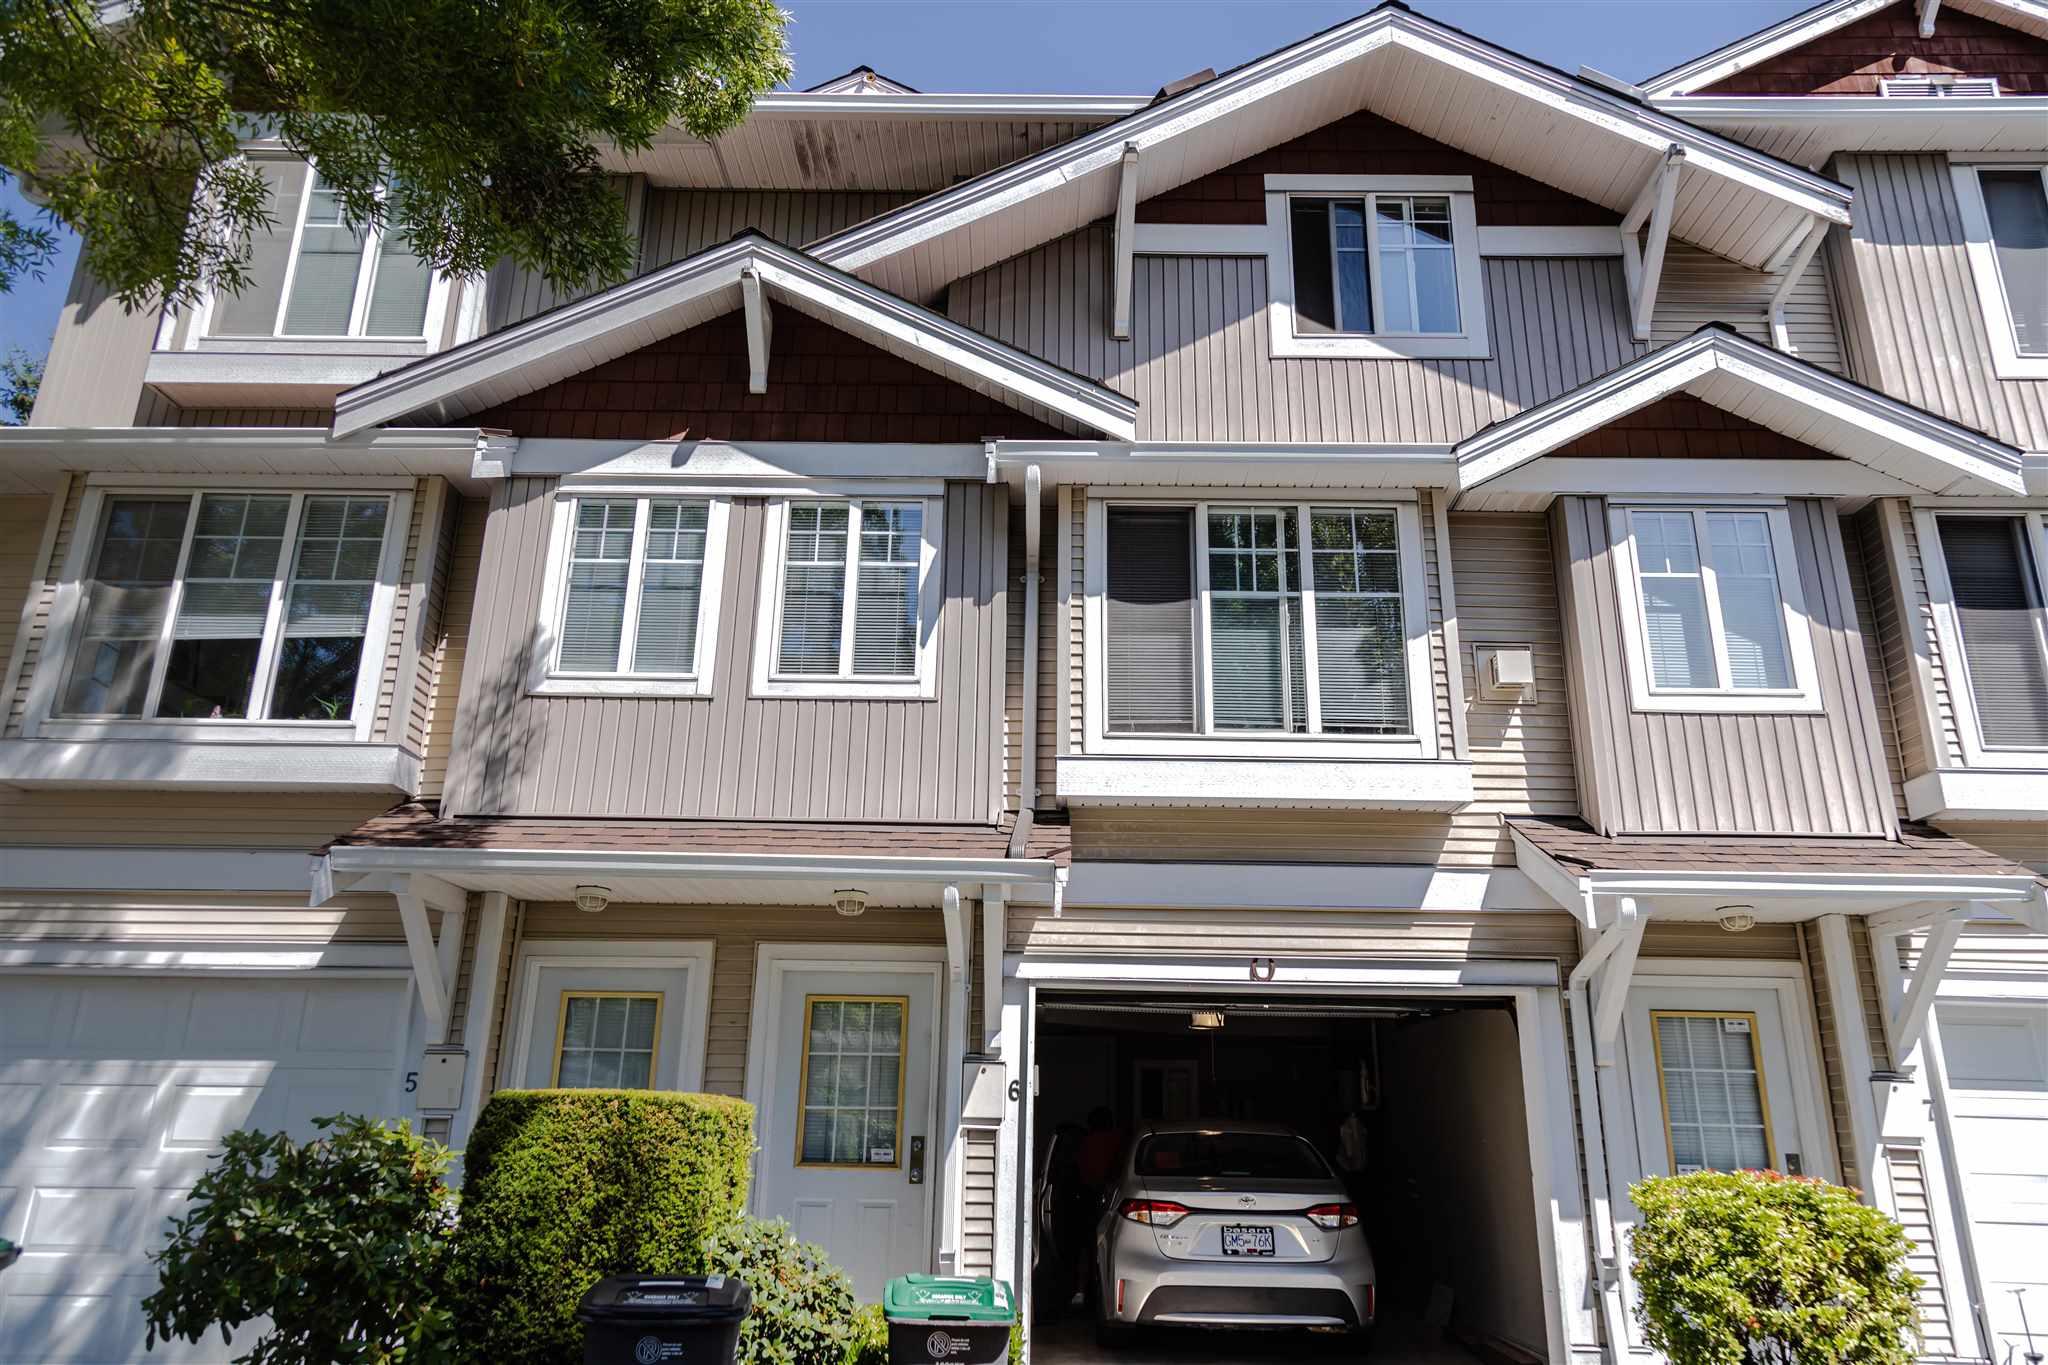 6 12110 75A AVENUE - West Newton Townhouse for sale, 3 Bedrooms (R2595351)